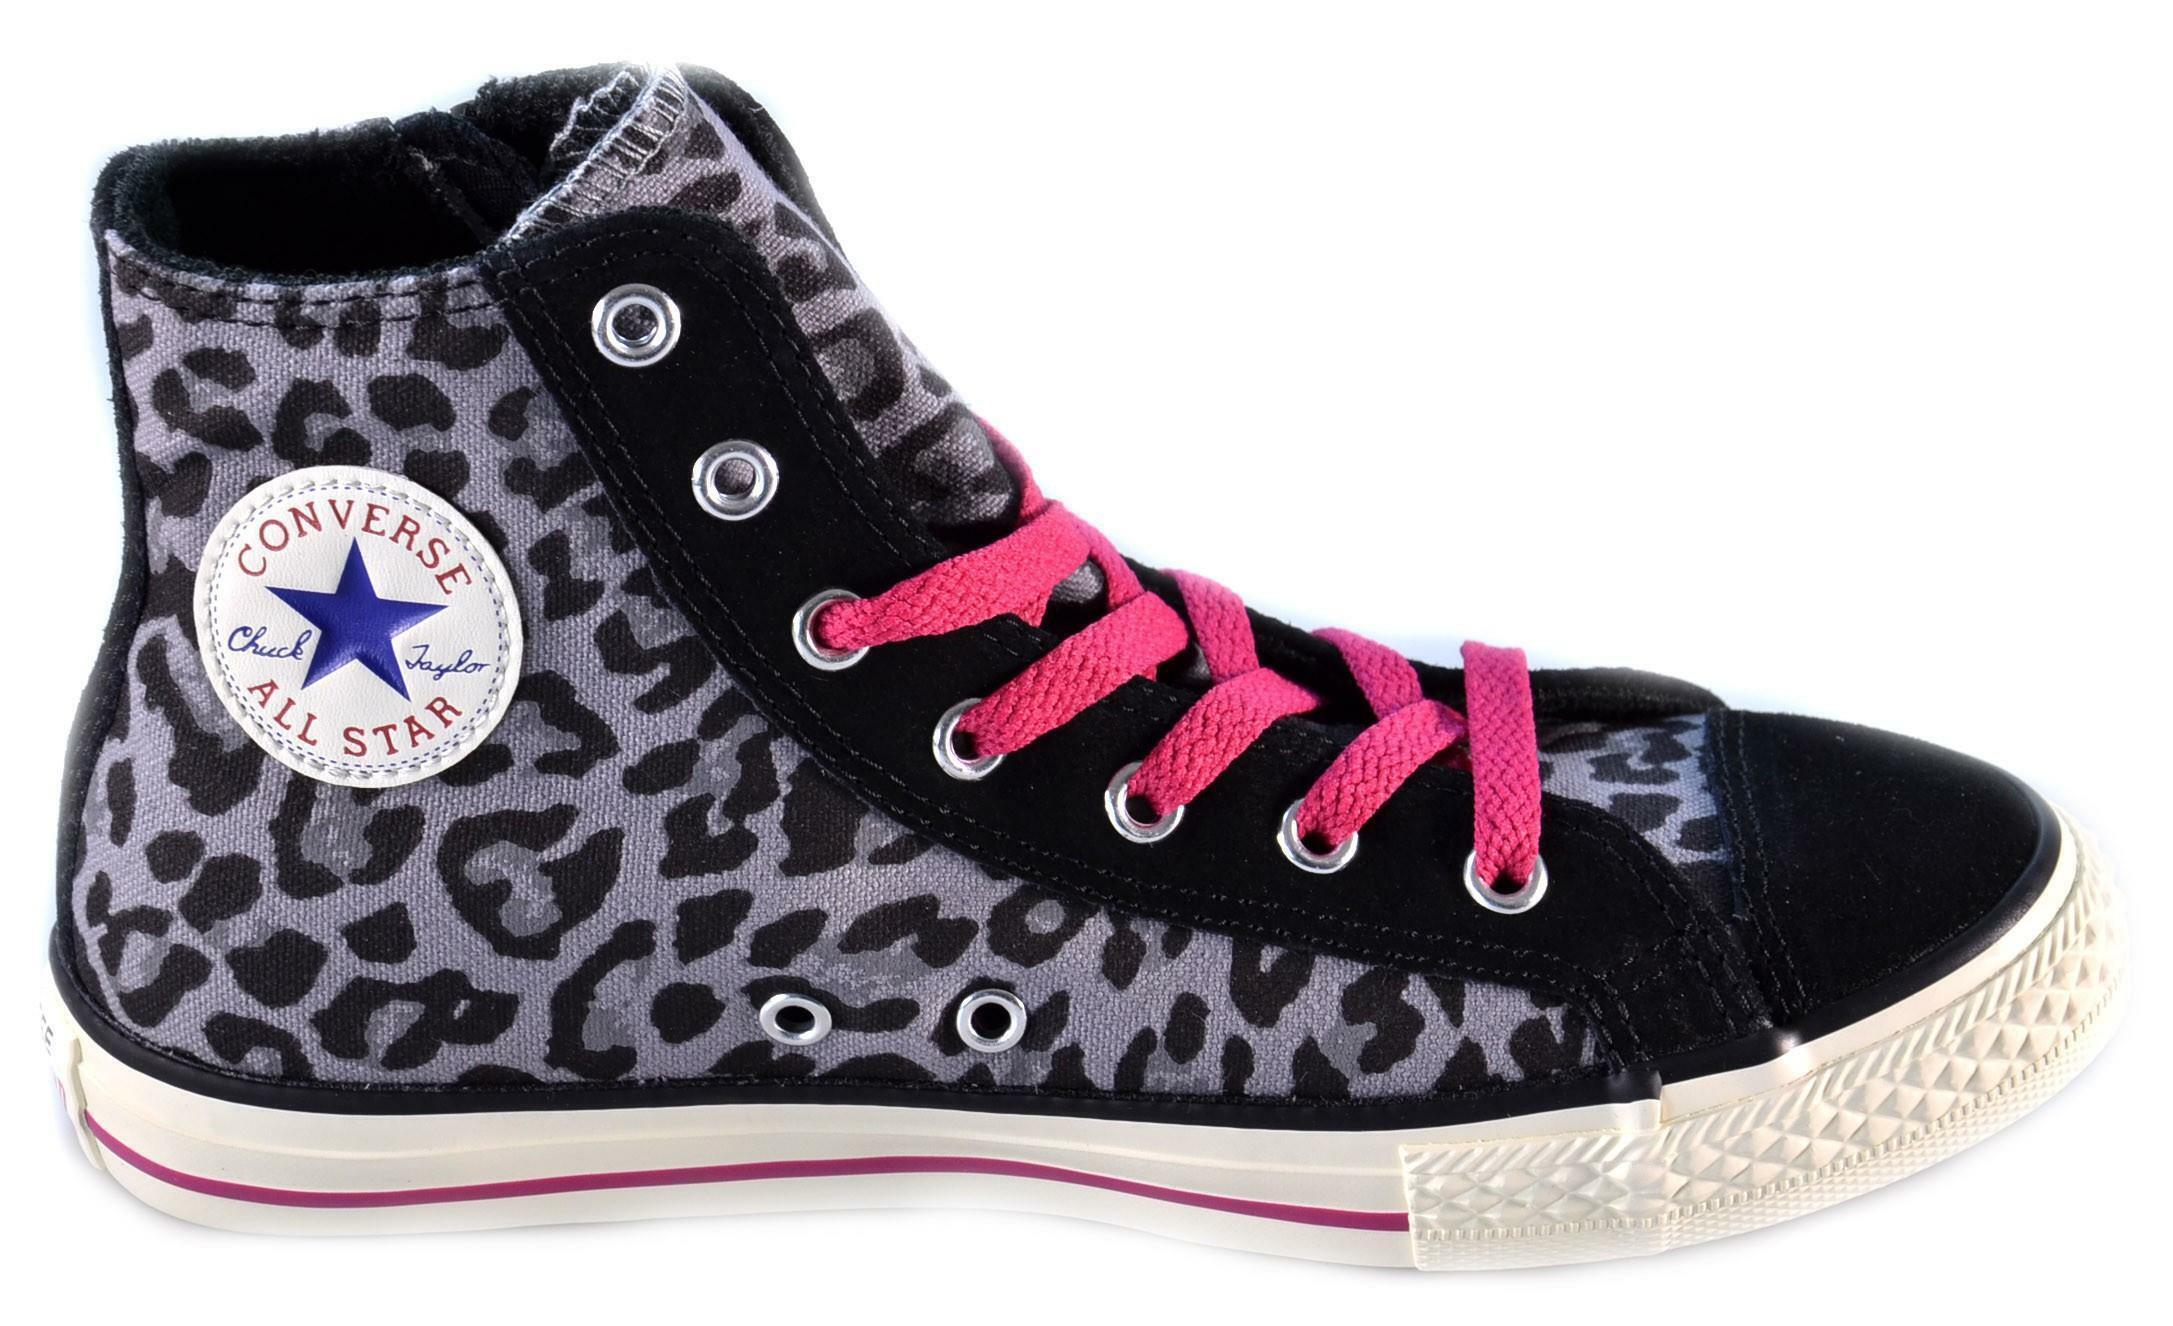 converse converse all star ct side zip hi charcoal scarpe donna bambina leopardate 646202